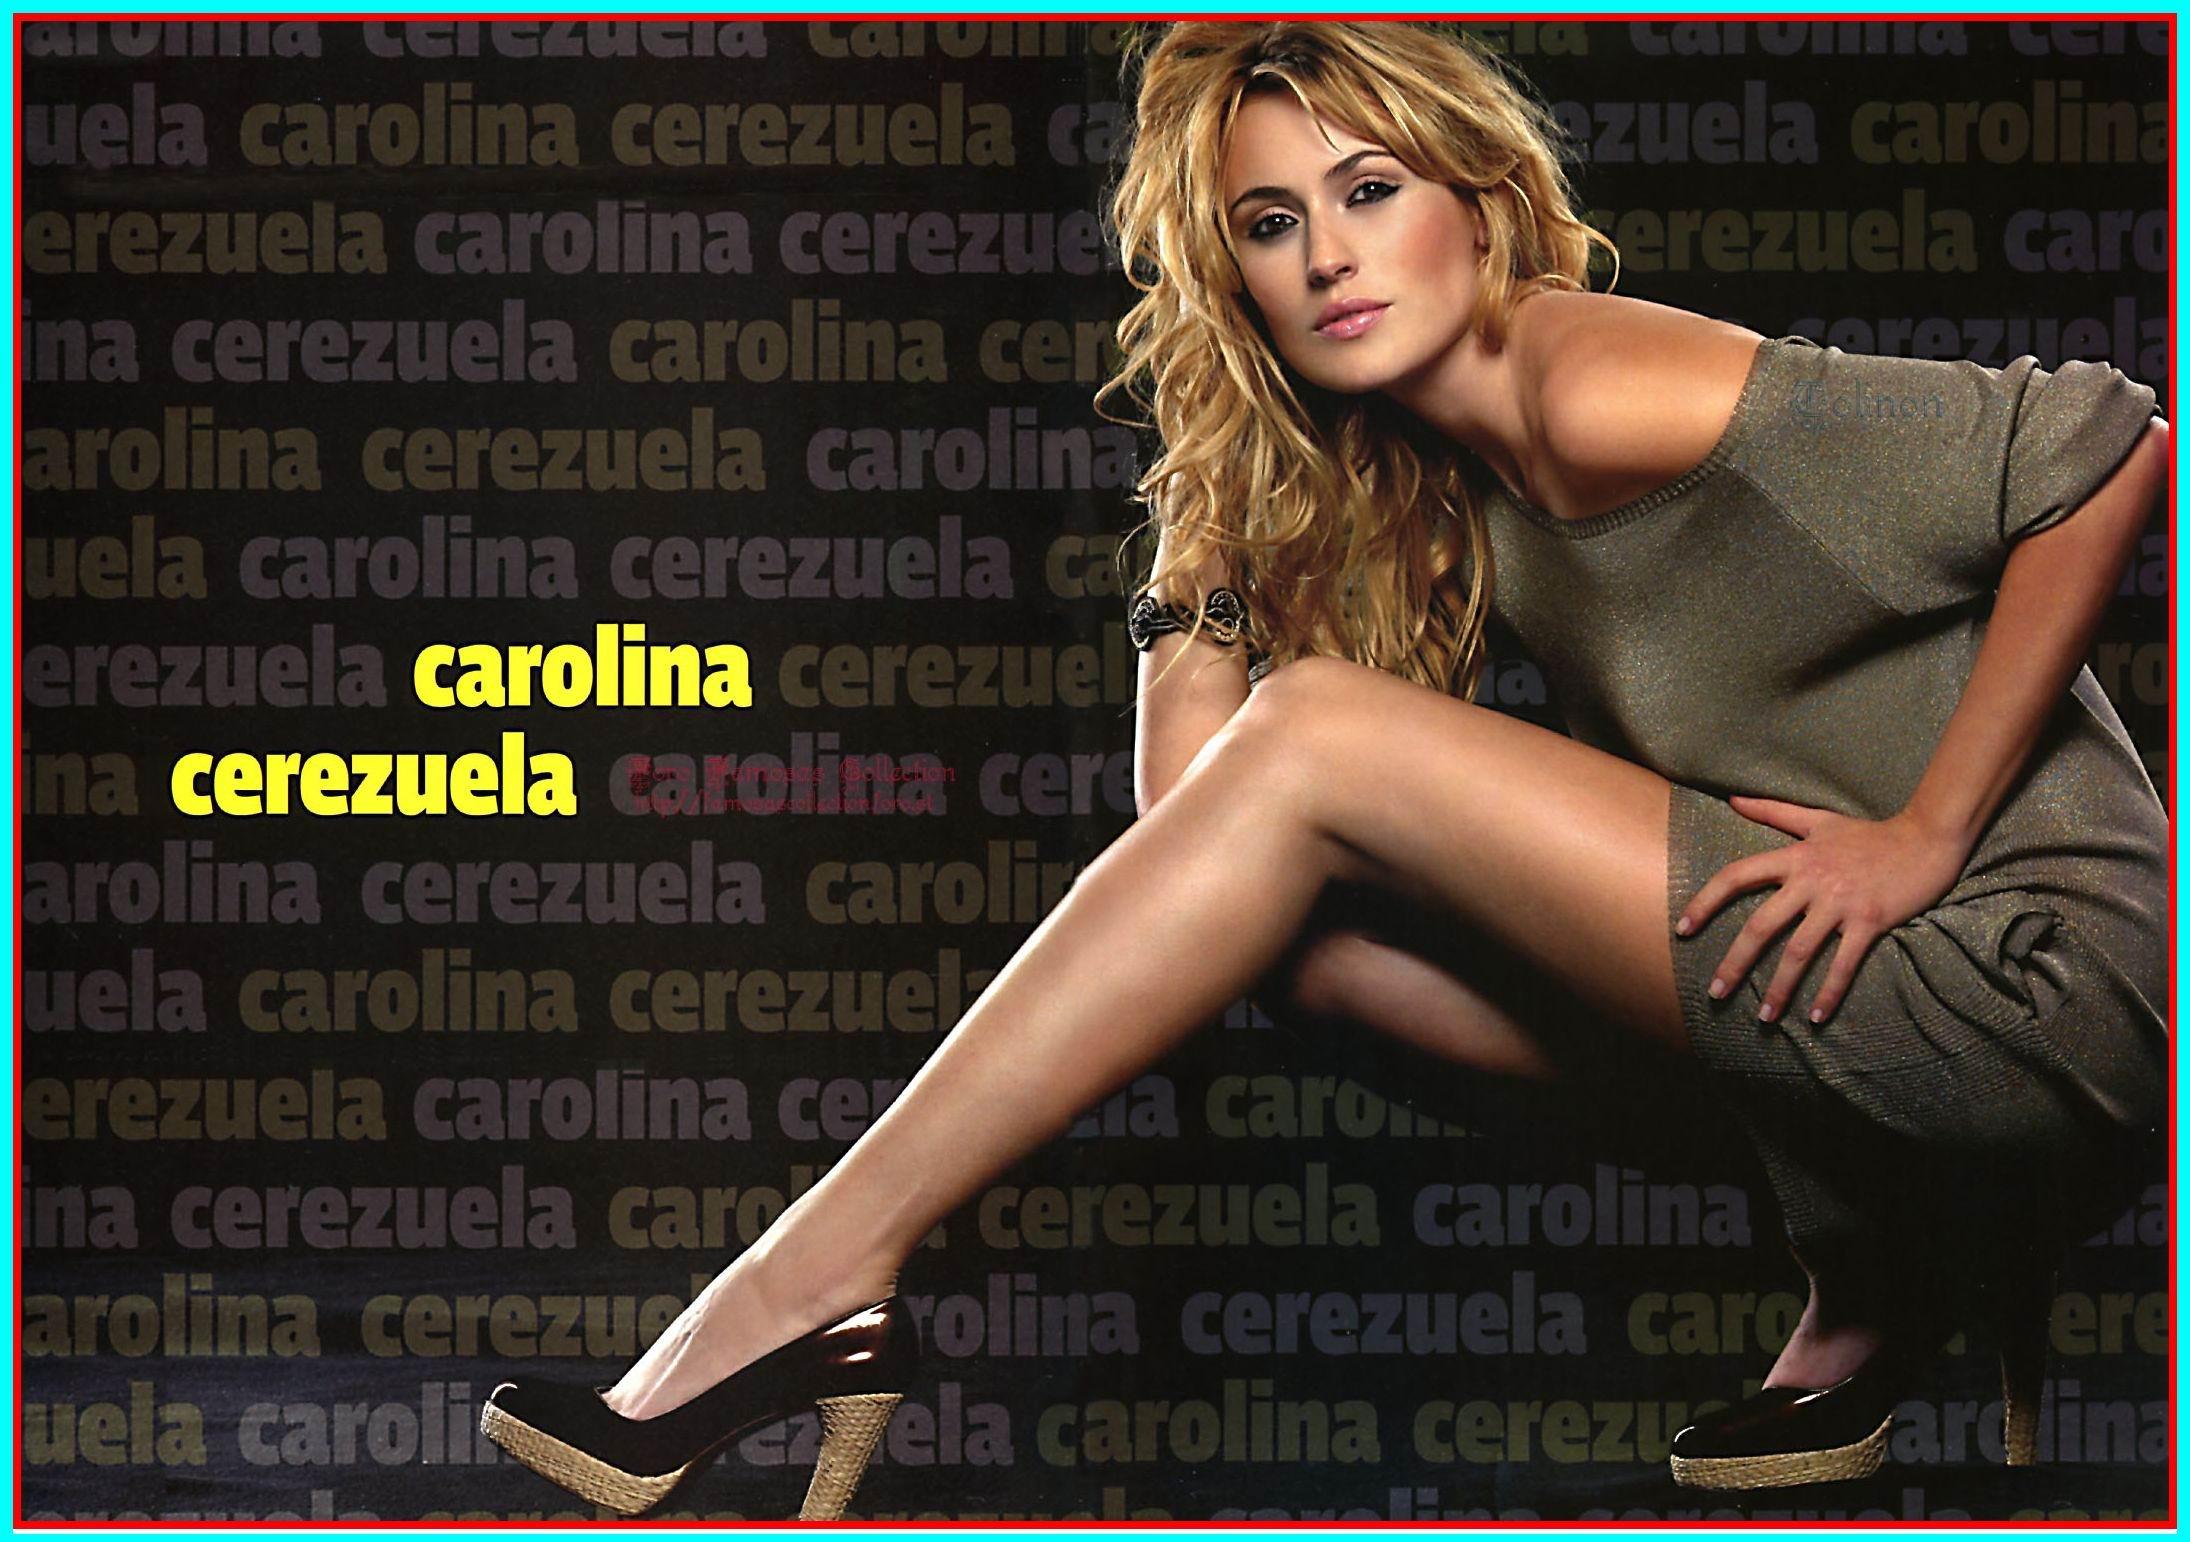 Carolina Cerezuela sesión